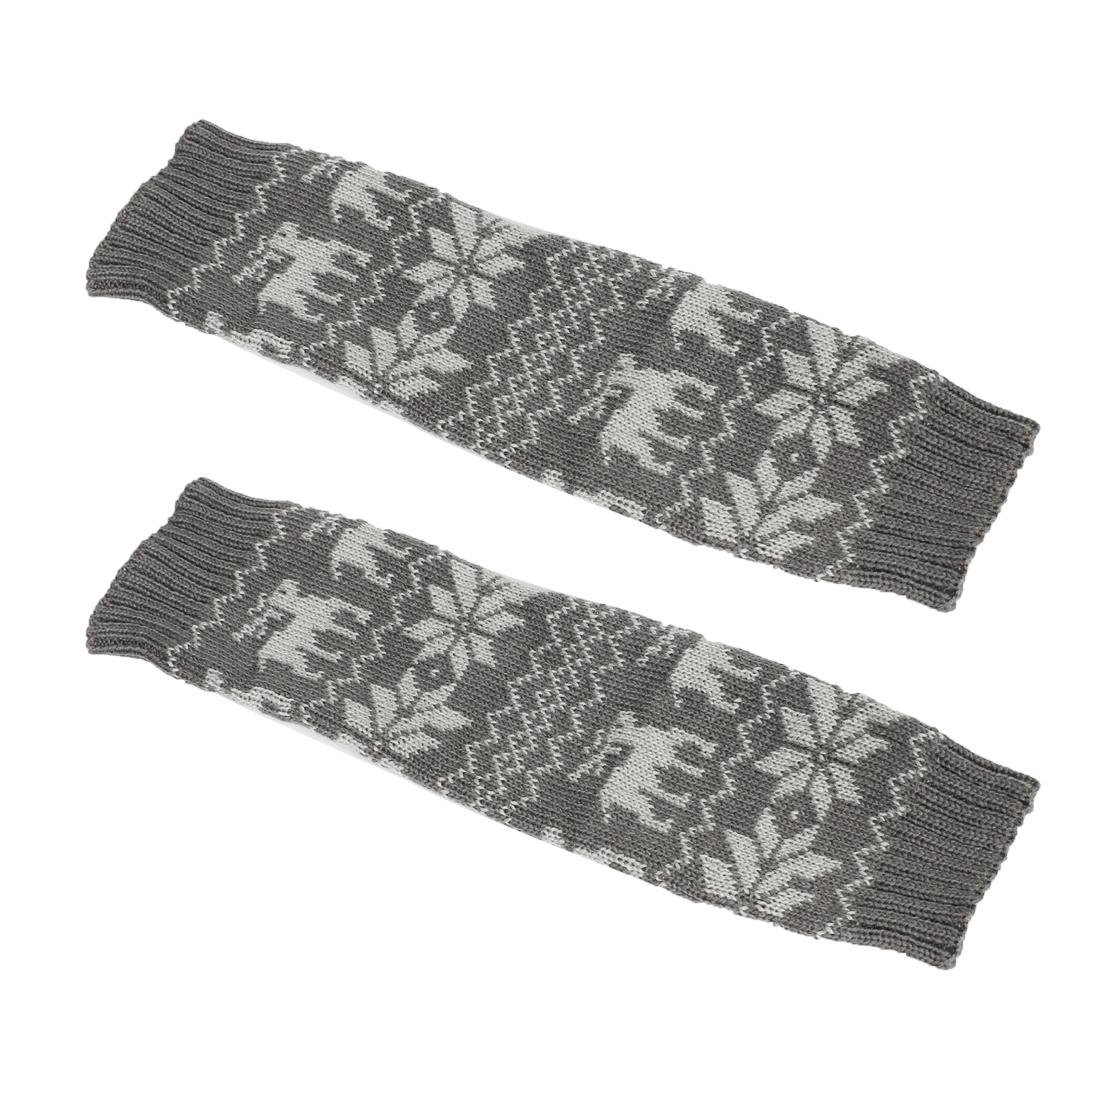 Pair Dark Gray Nordic Pattern Stretchy Toeless Knee High Leg Warmer Socks for Lady